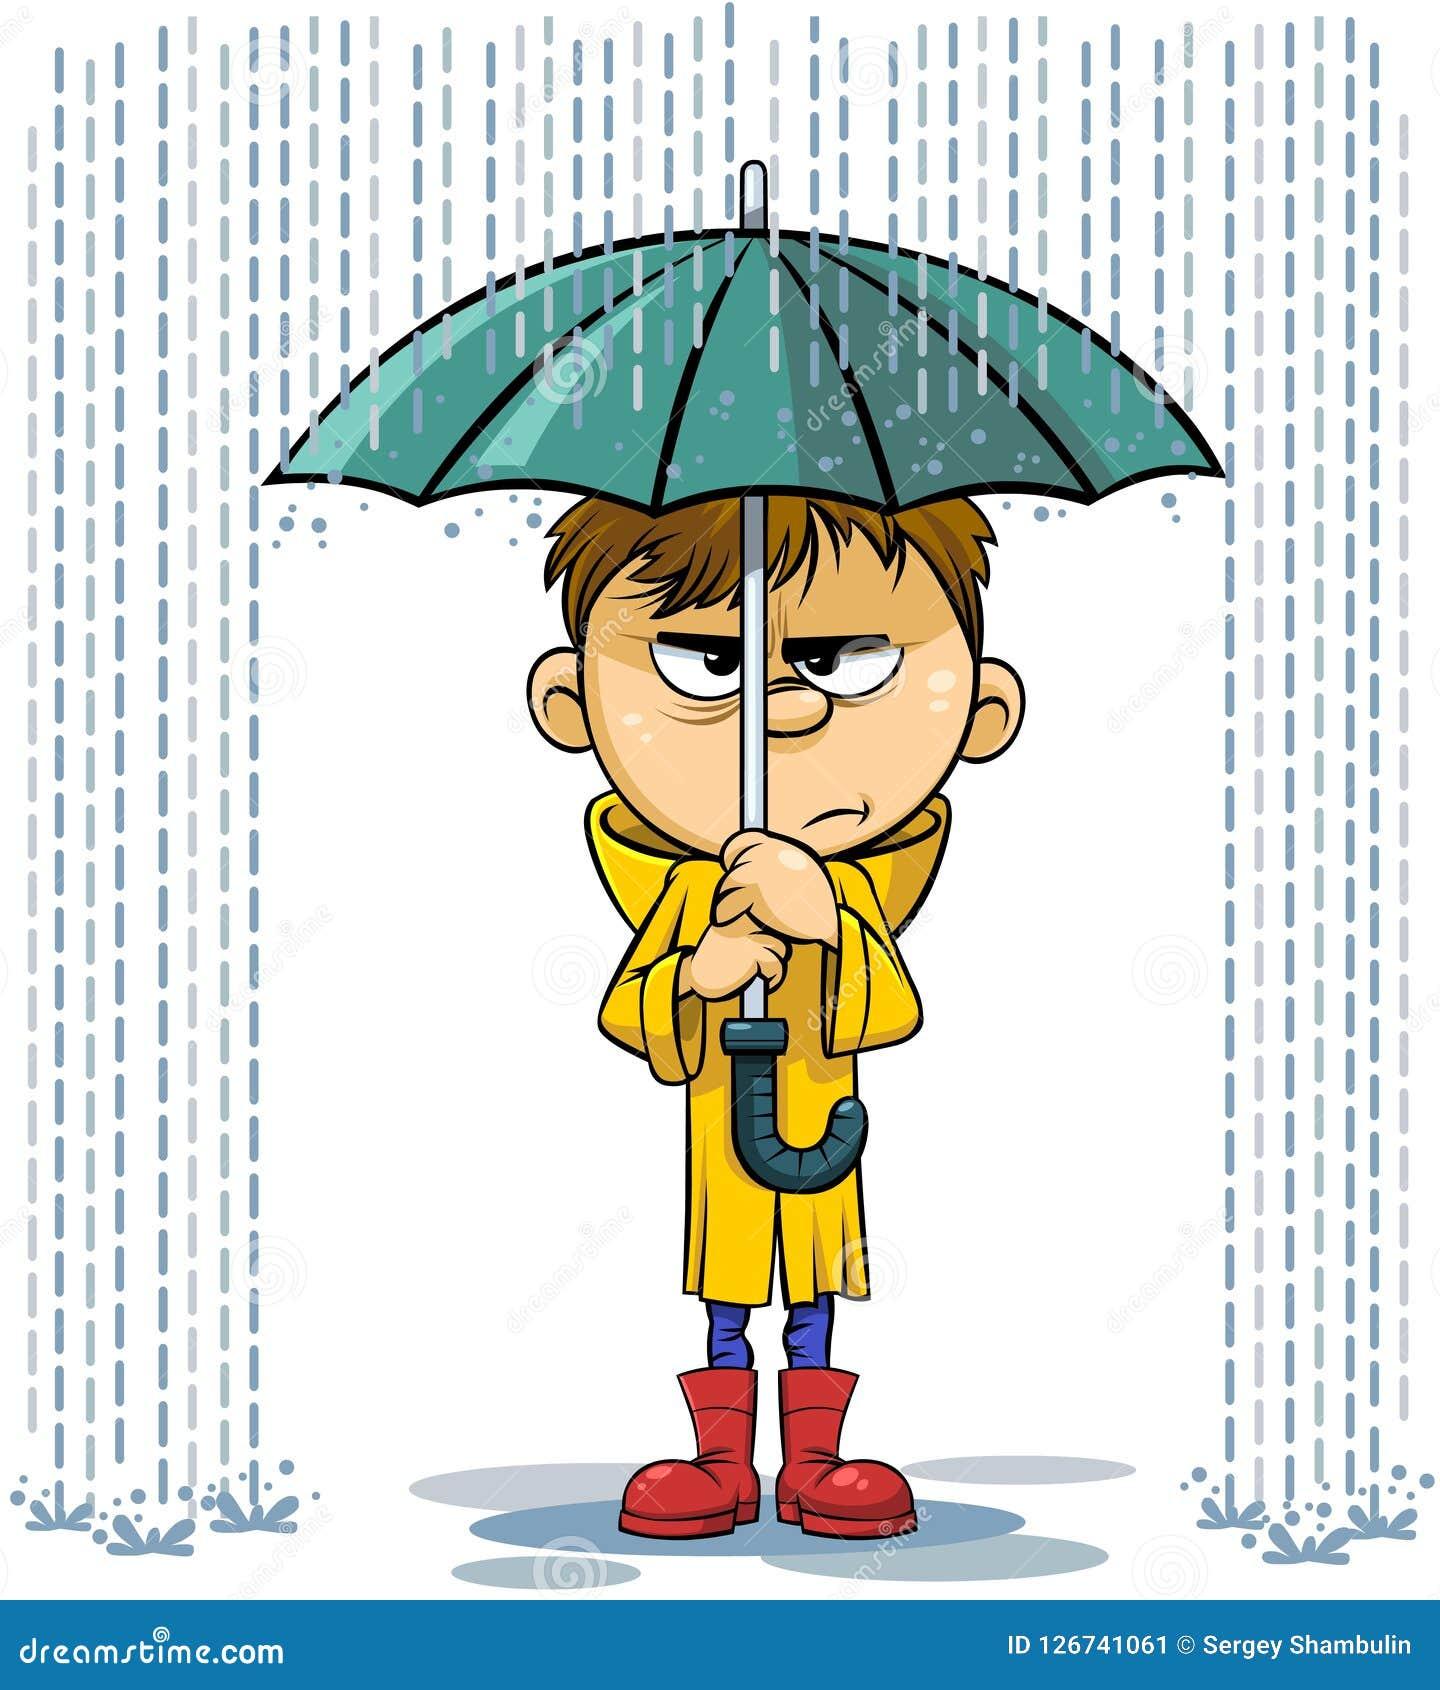 Rain And Umbrella Cartoon Illustration Stock Vector ...